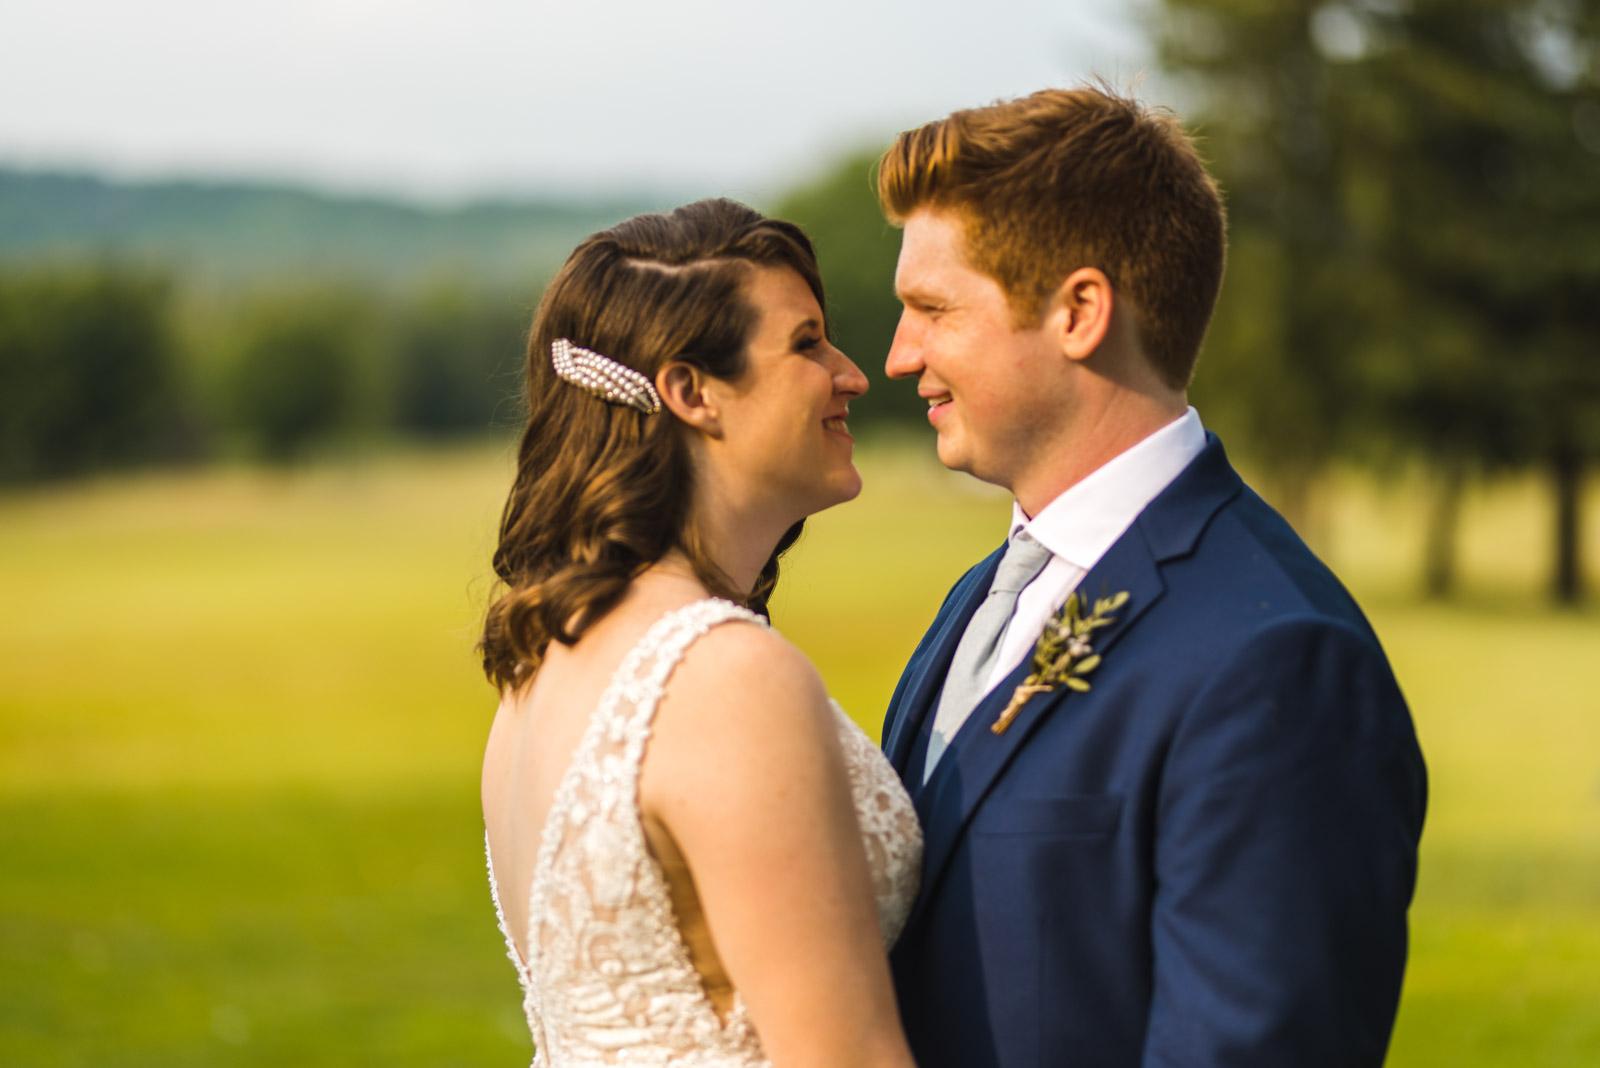 Emerson & Elicia's Golf Course Wedding Aidan & Leanne Hennebry Hamilton Wedding Videographers Photographers Niagara Hush Hush Photography & Film-52.jpg